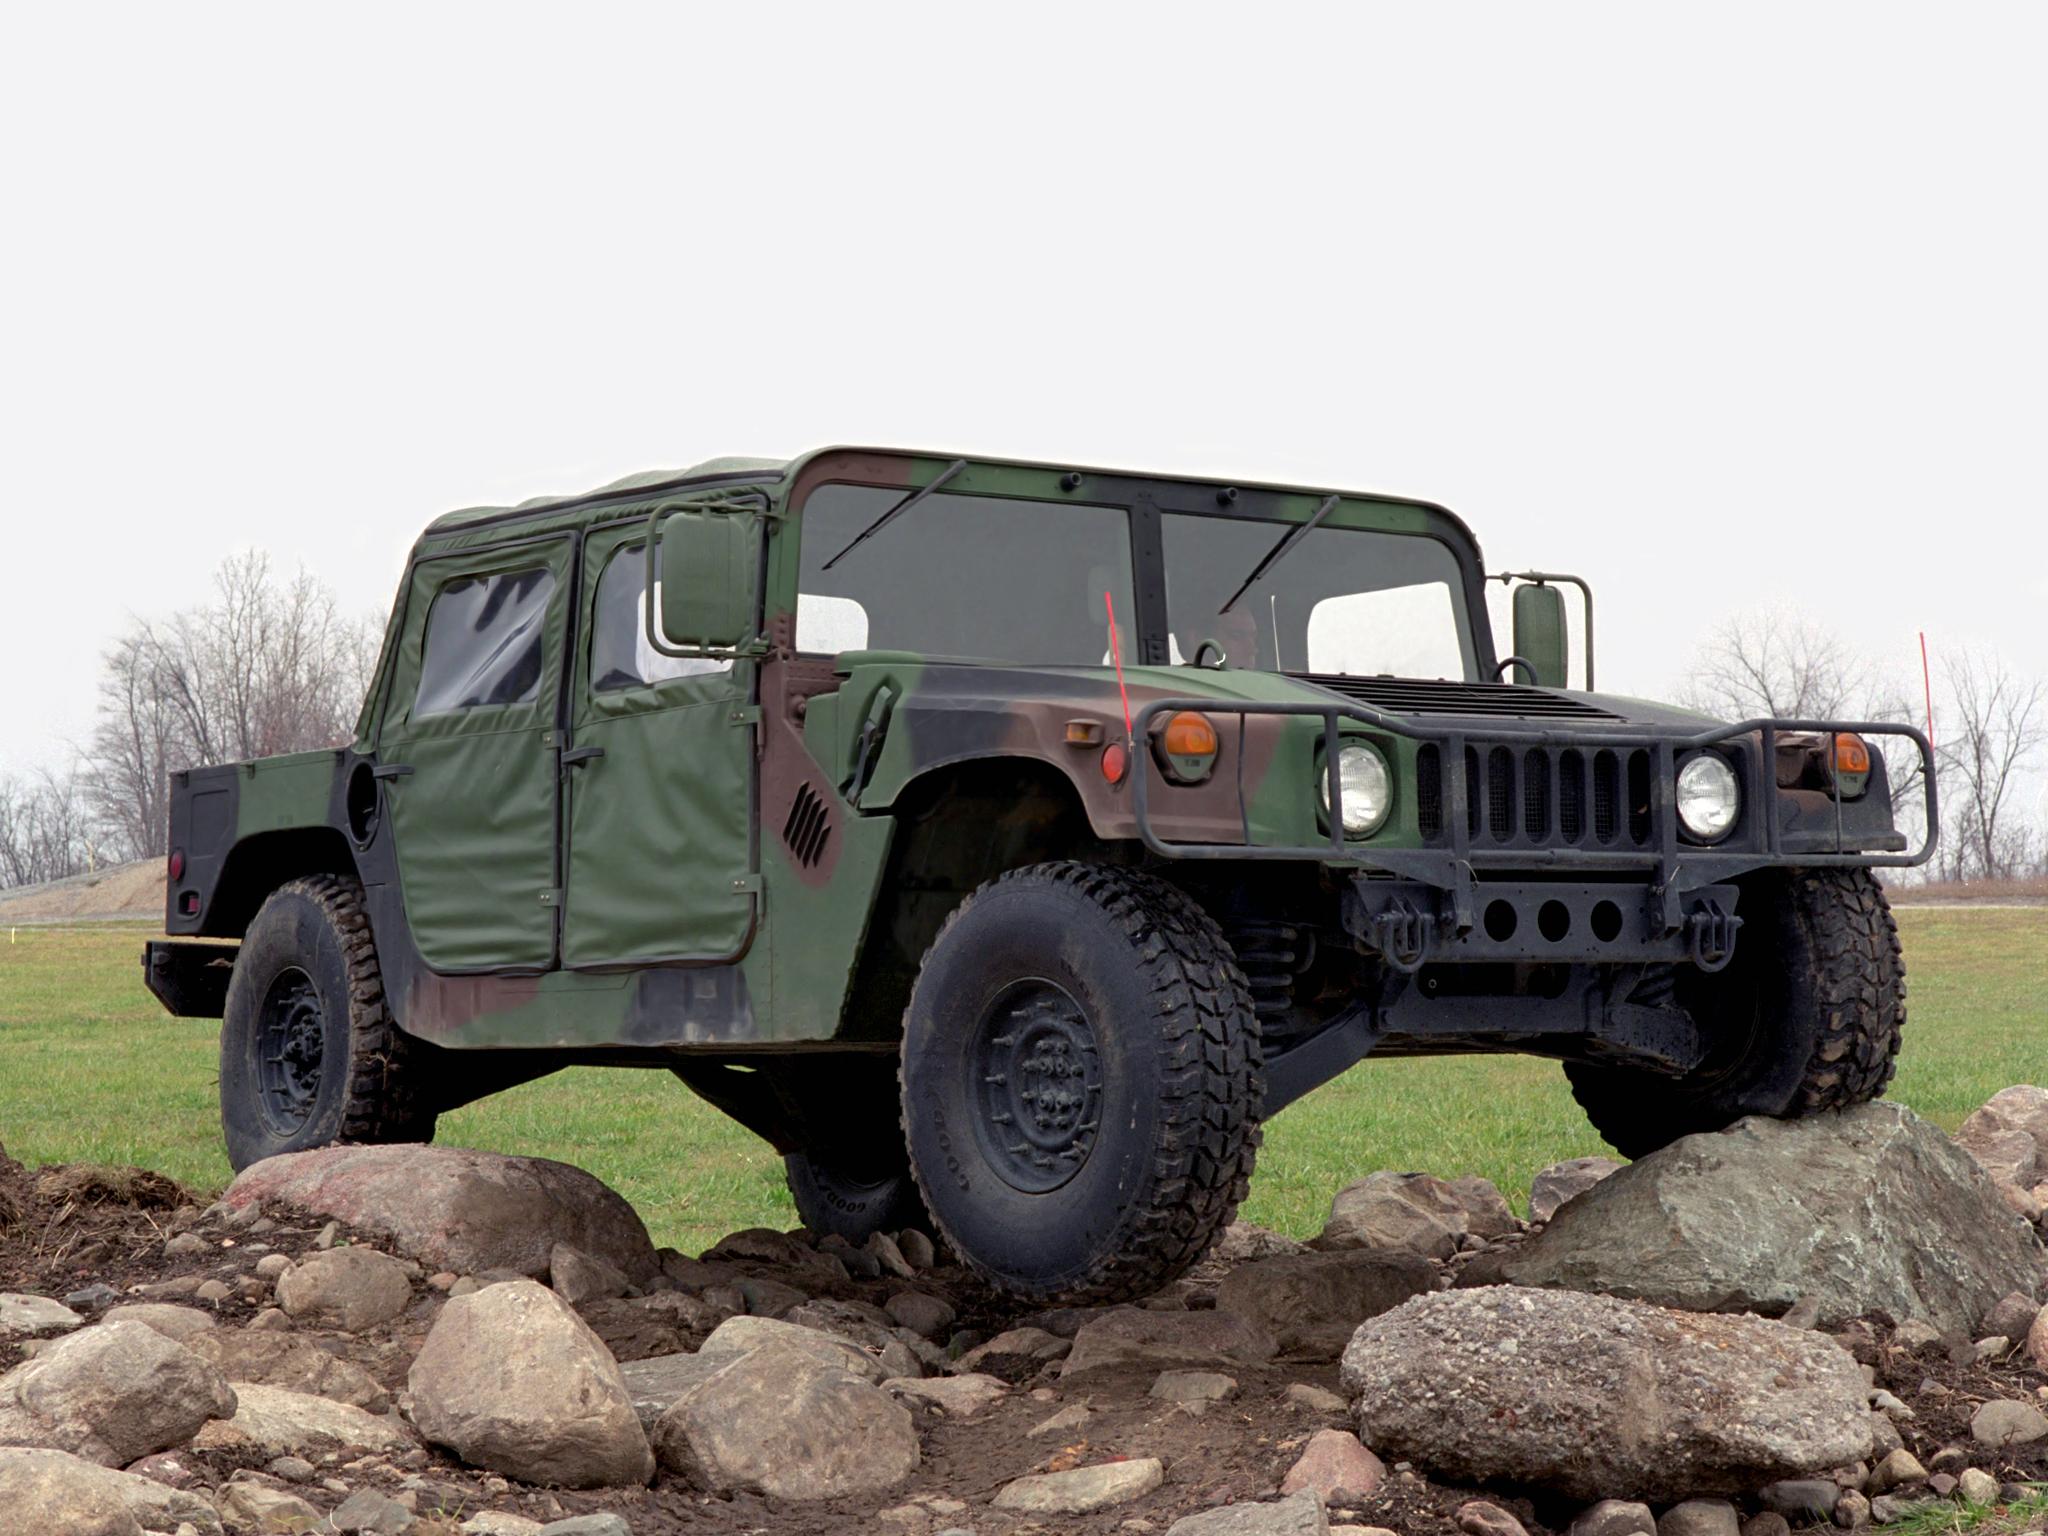 1984 hmmwv m998 hummer military 4x4 offroad truck trucks w wallpaper 2048x1536 94612. Black Bedroom Furniture Sets. Home Design Ideas